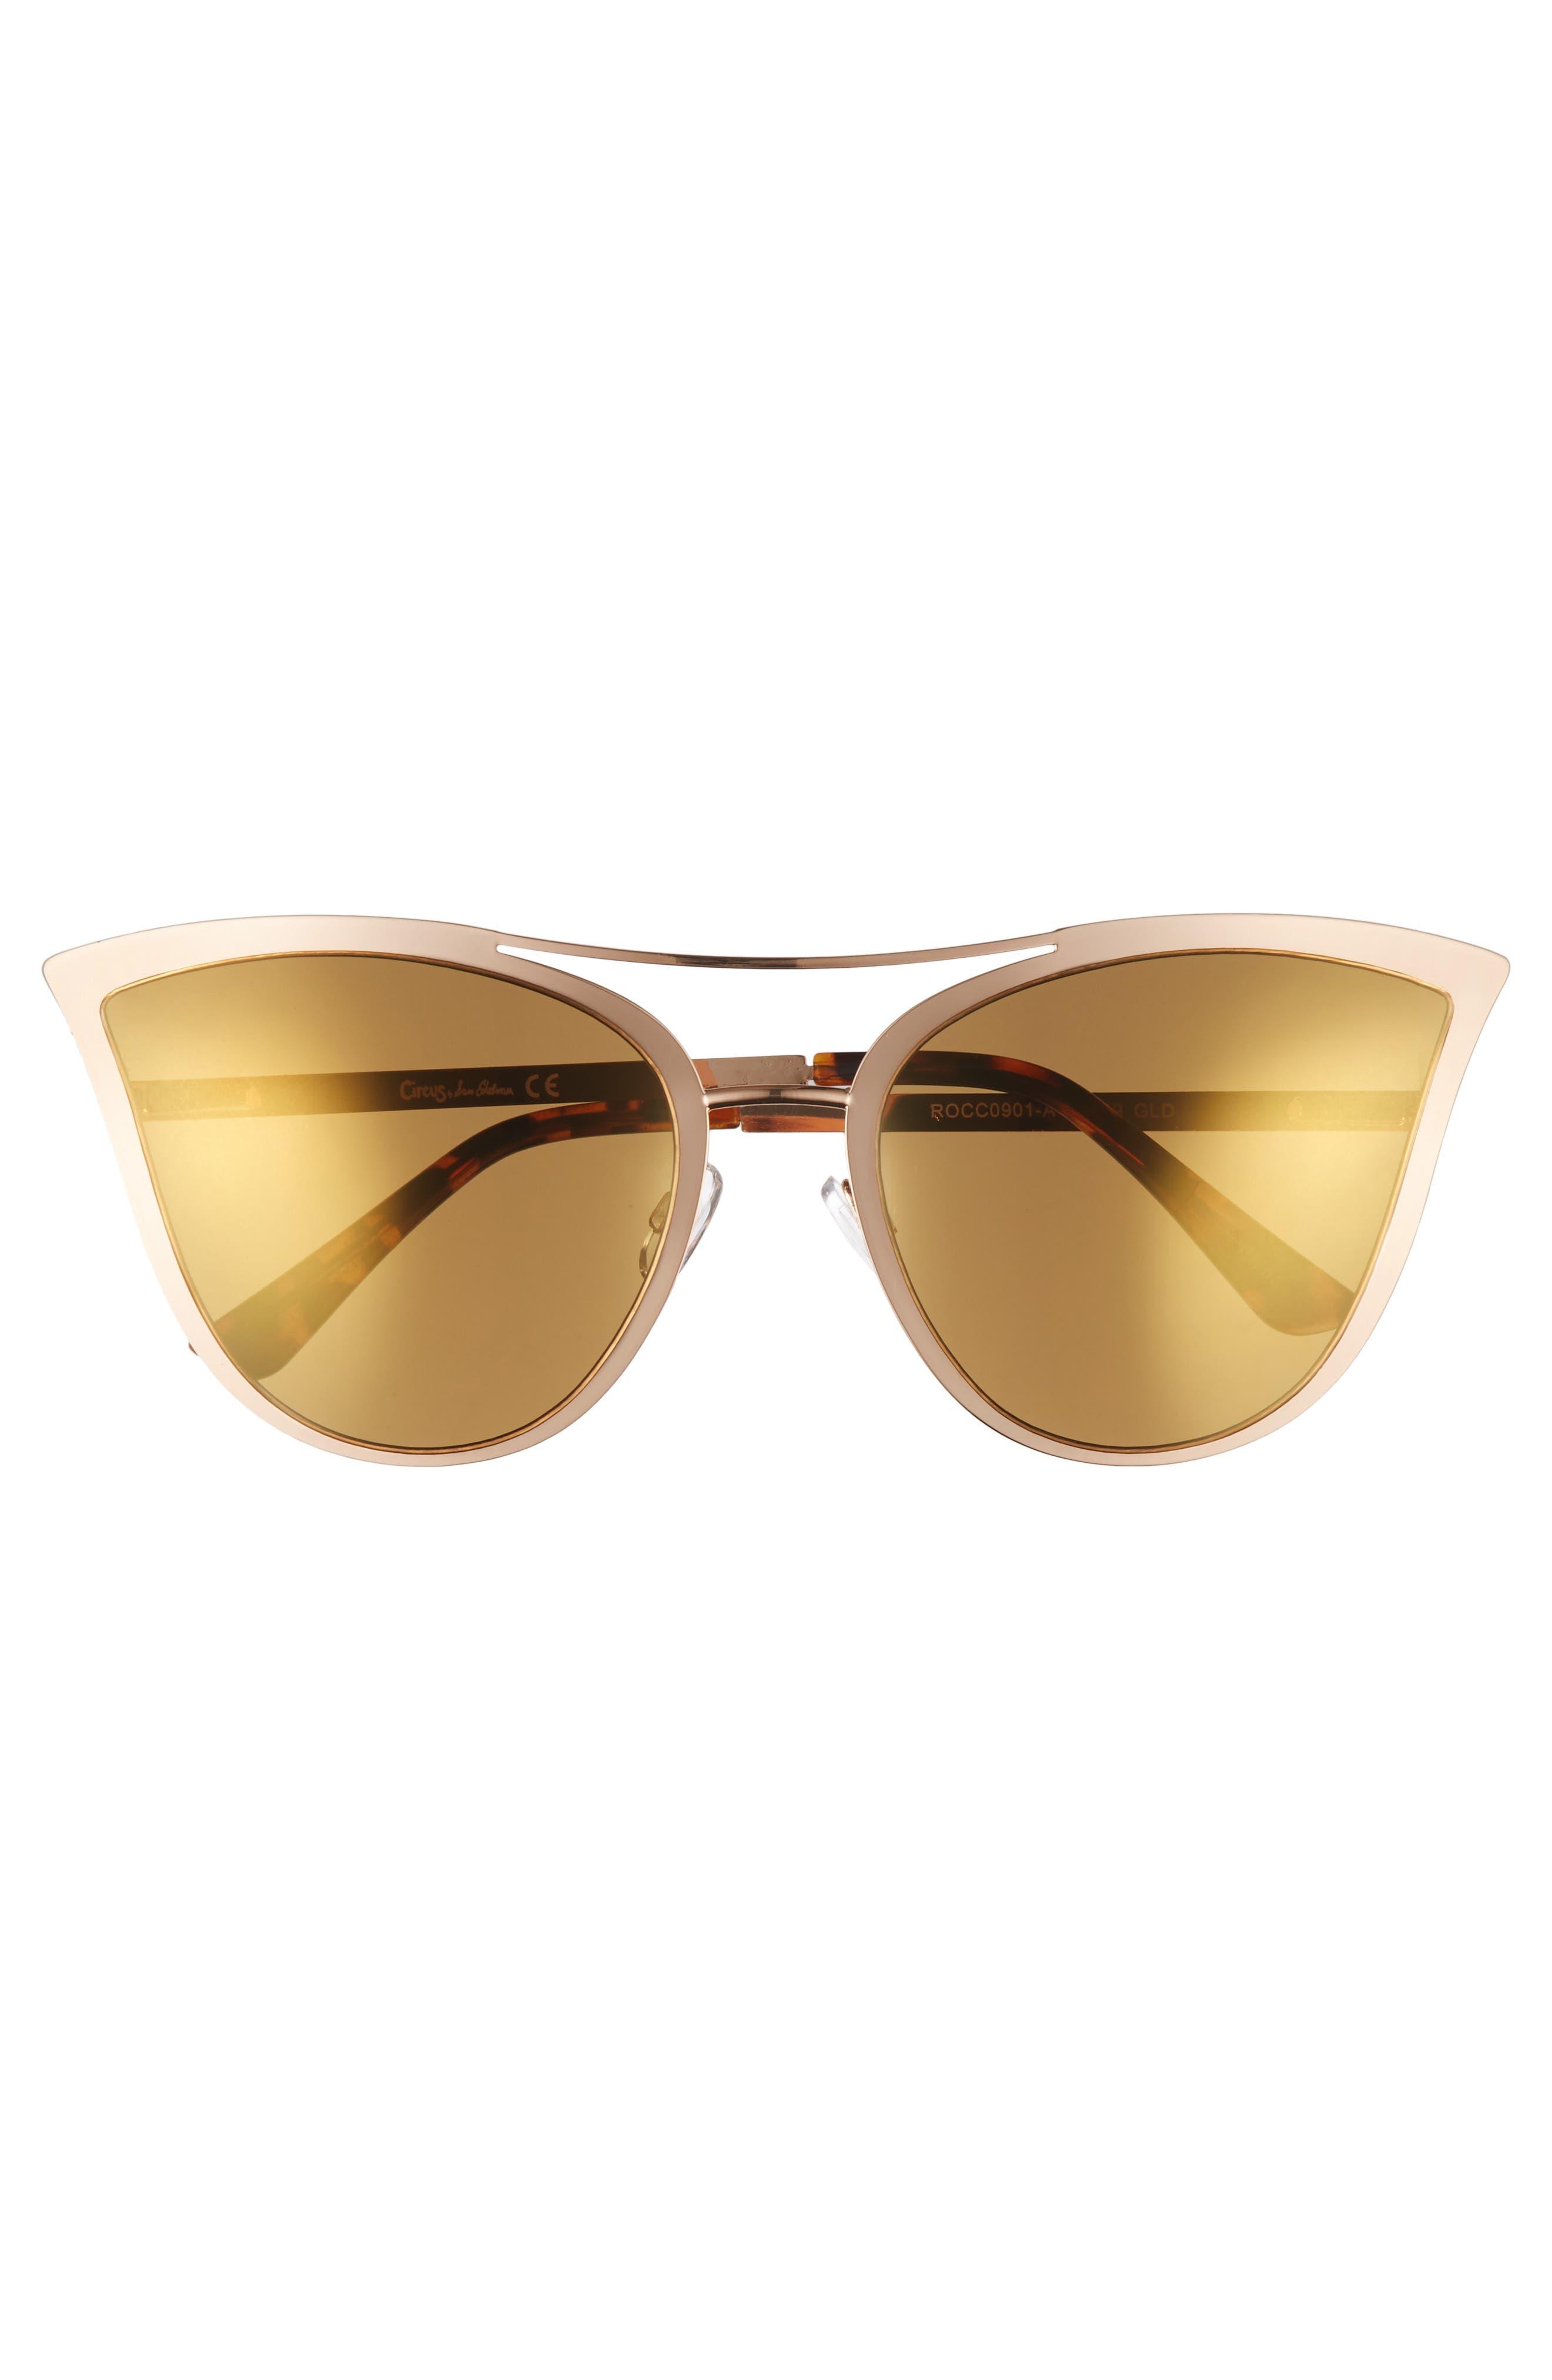 61mm Metal Cat Eye Sunglasses,                             Alternate thumbnail 9, color,